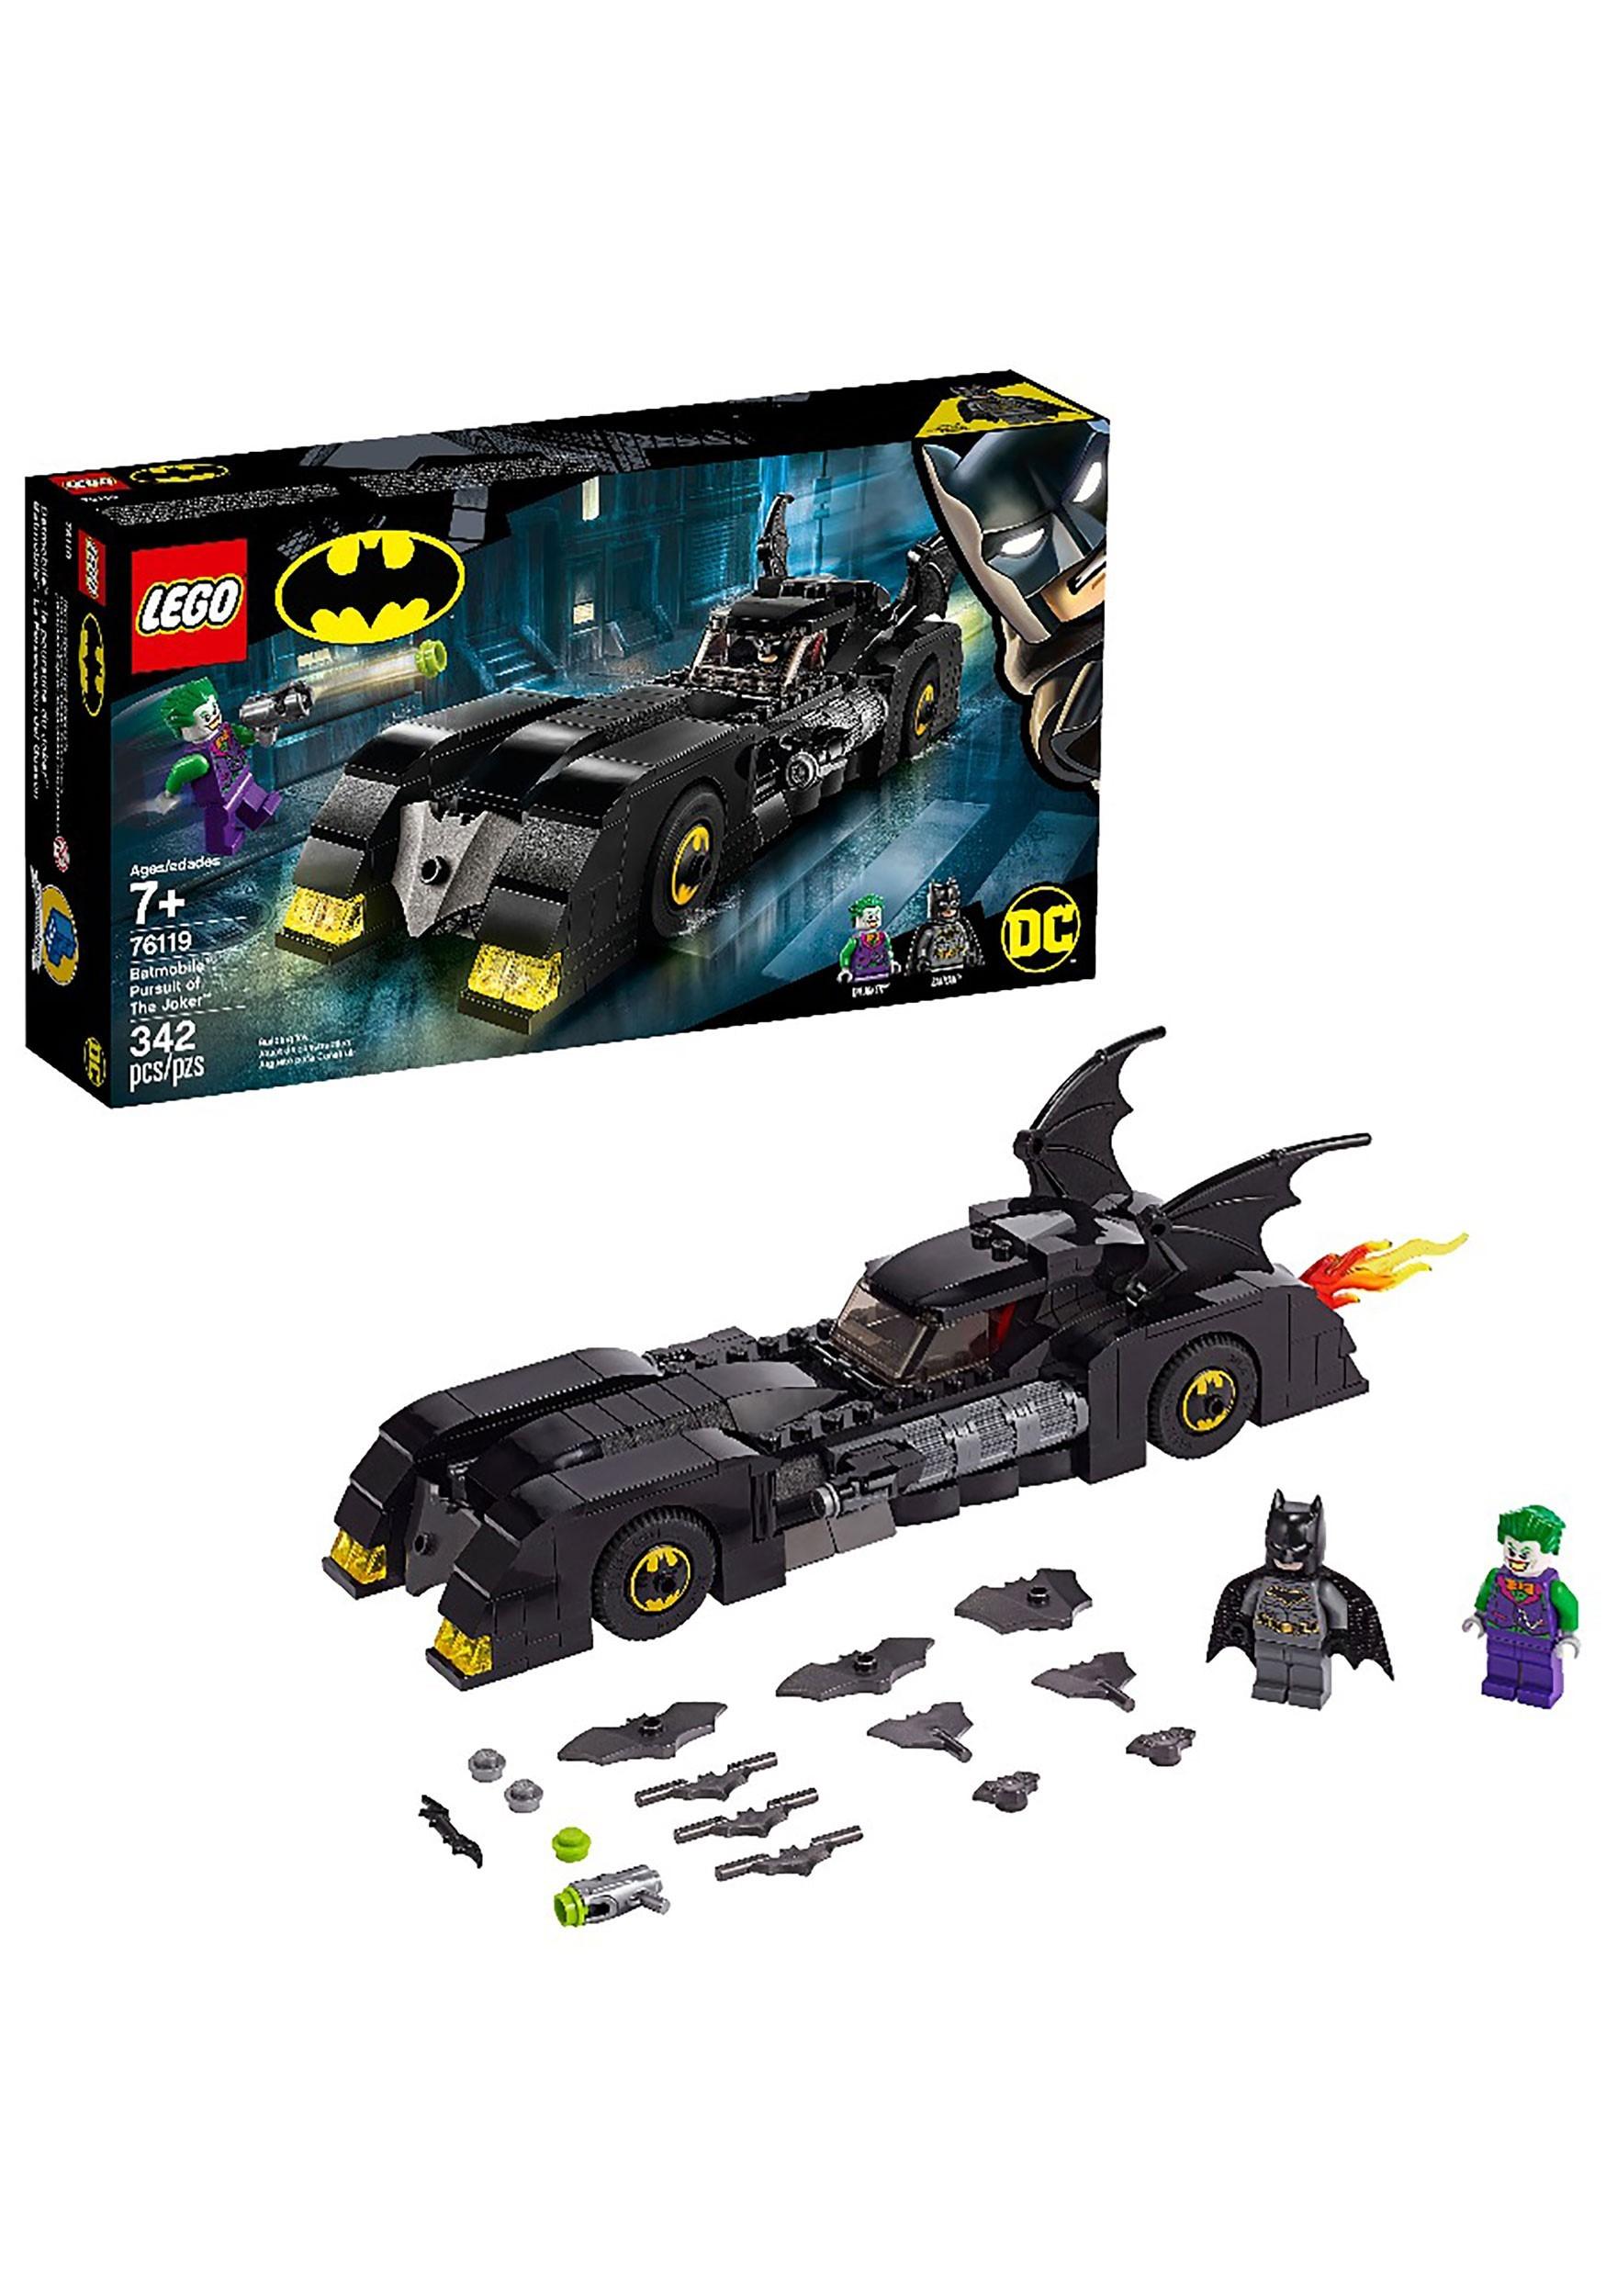 Super Heroes Batmobile: Pursuit of the Joker LEGO set